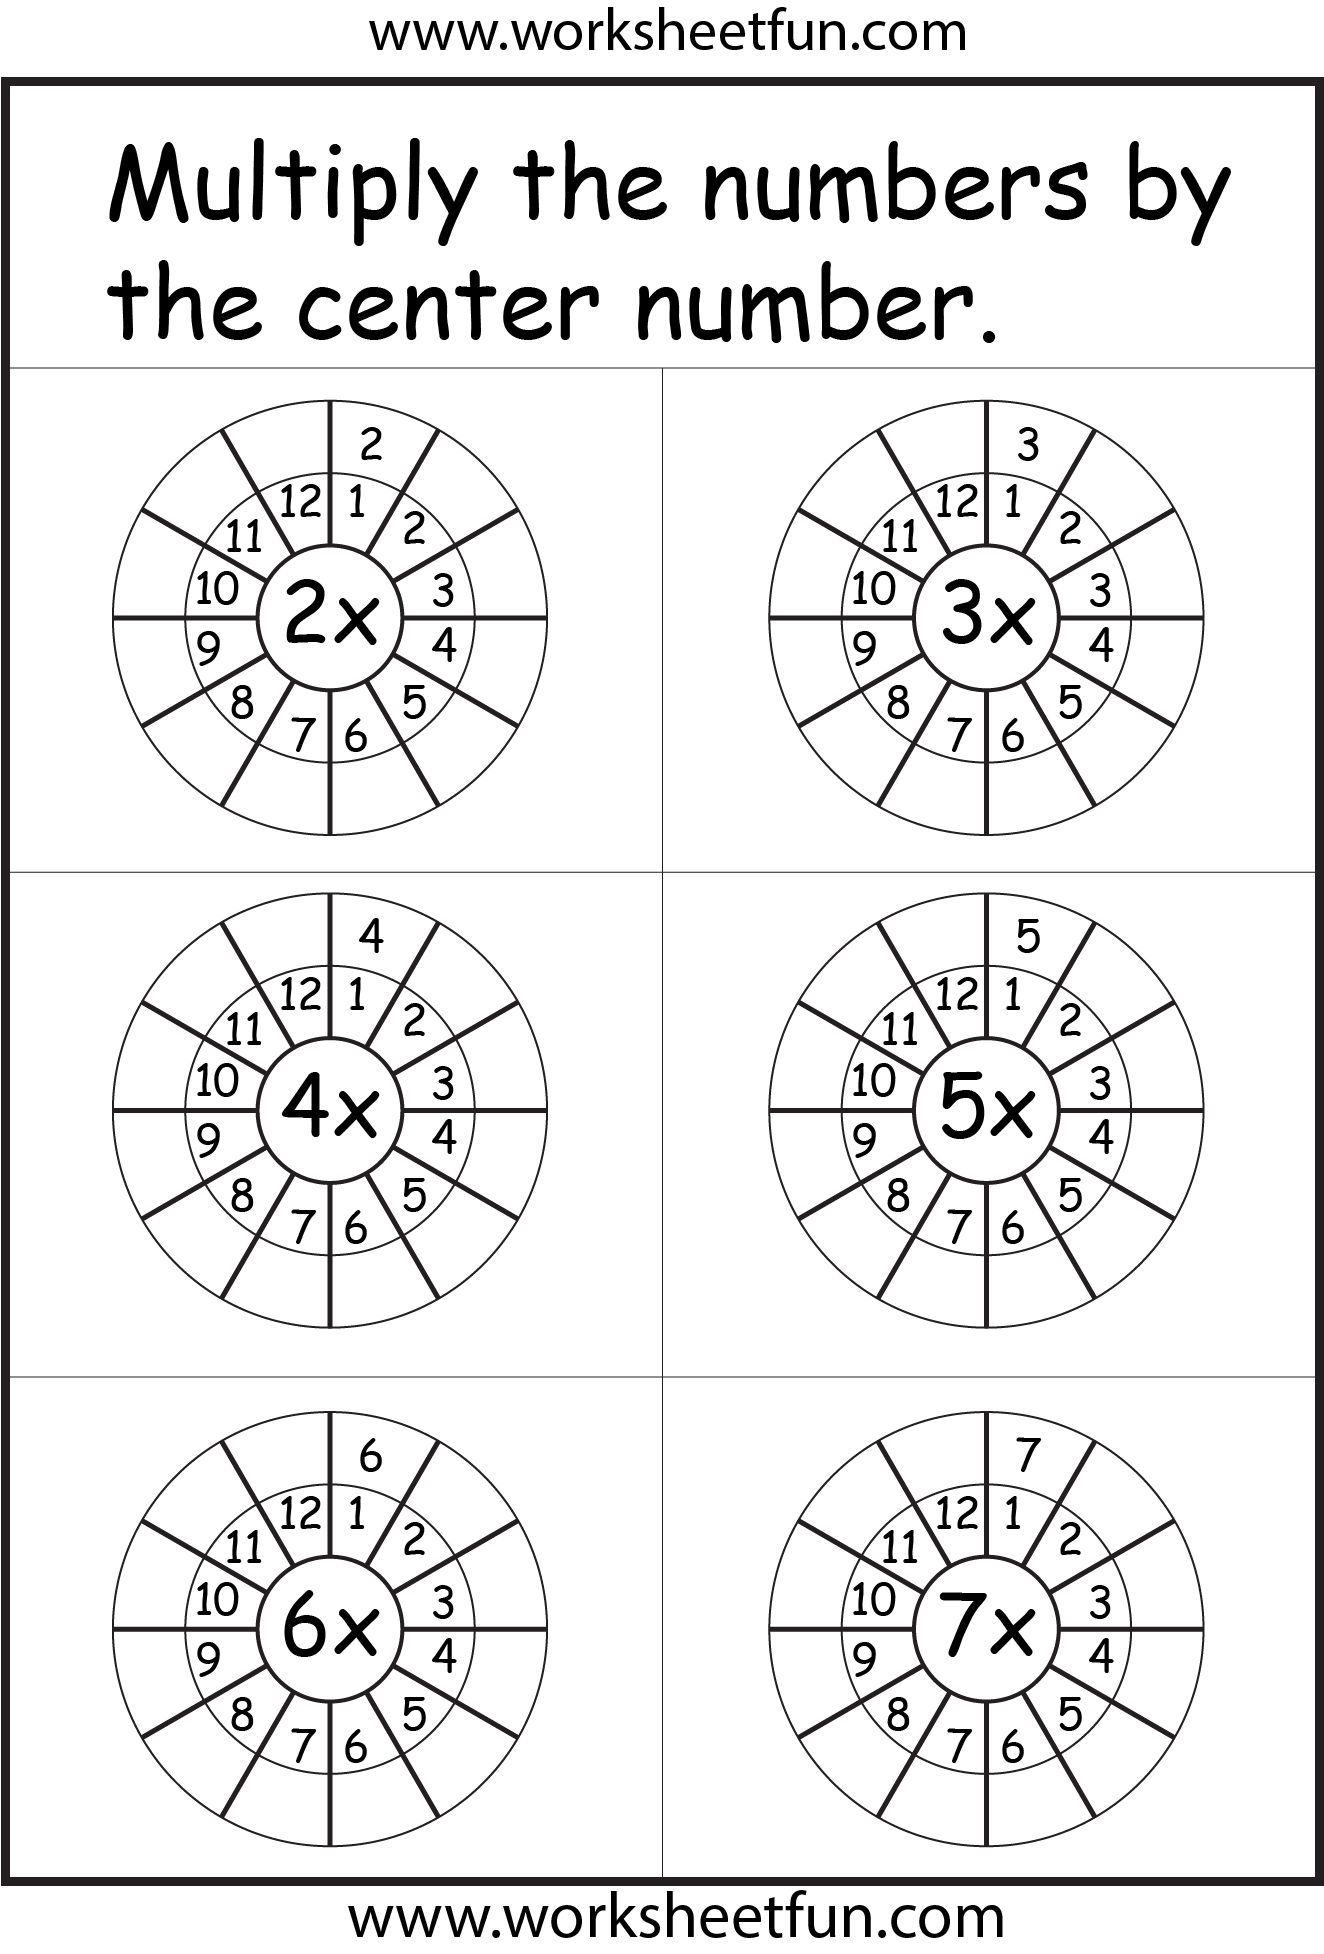 2 3 4 5 6 7 Times Tables Worksheets Printable Worksheets